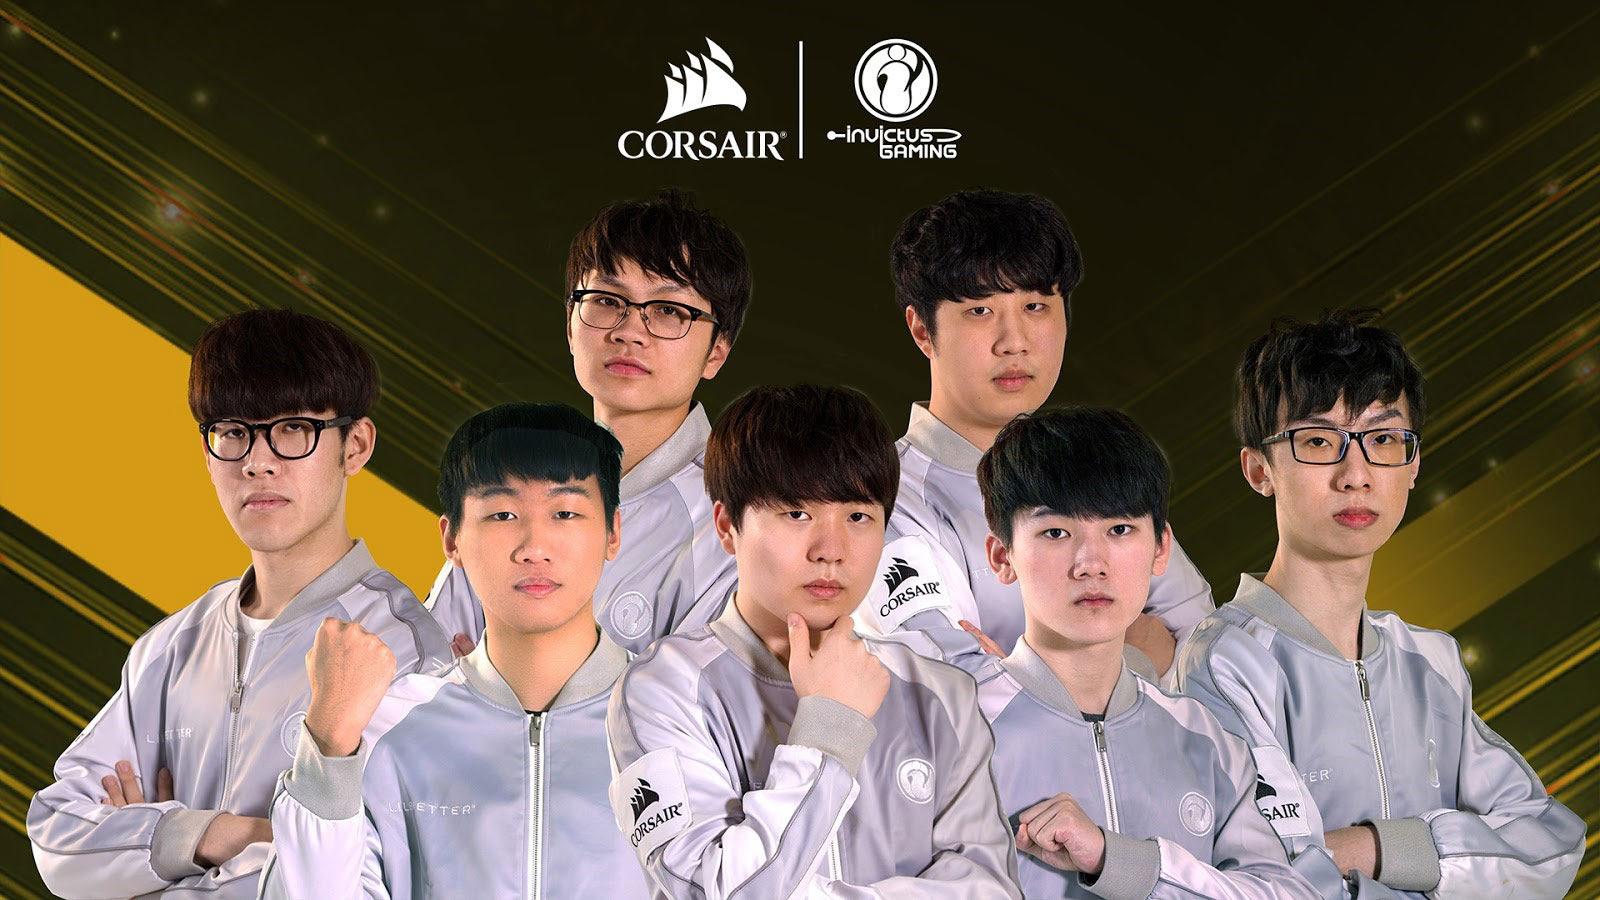 CORSAIR Partners with Esports Team Invictus Gaming - Legit Reviews